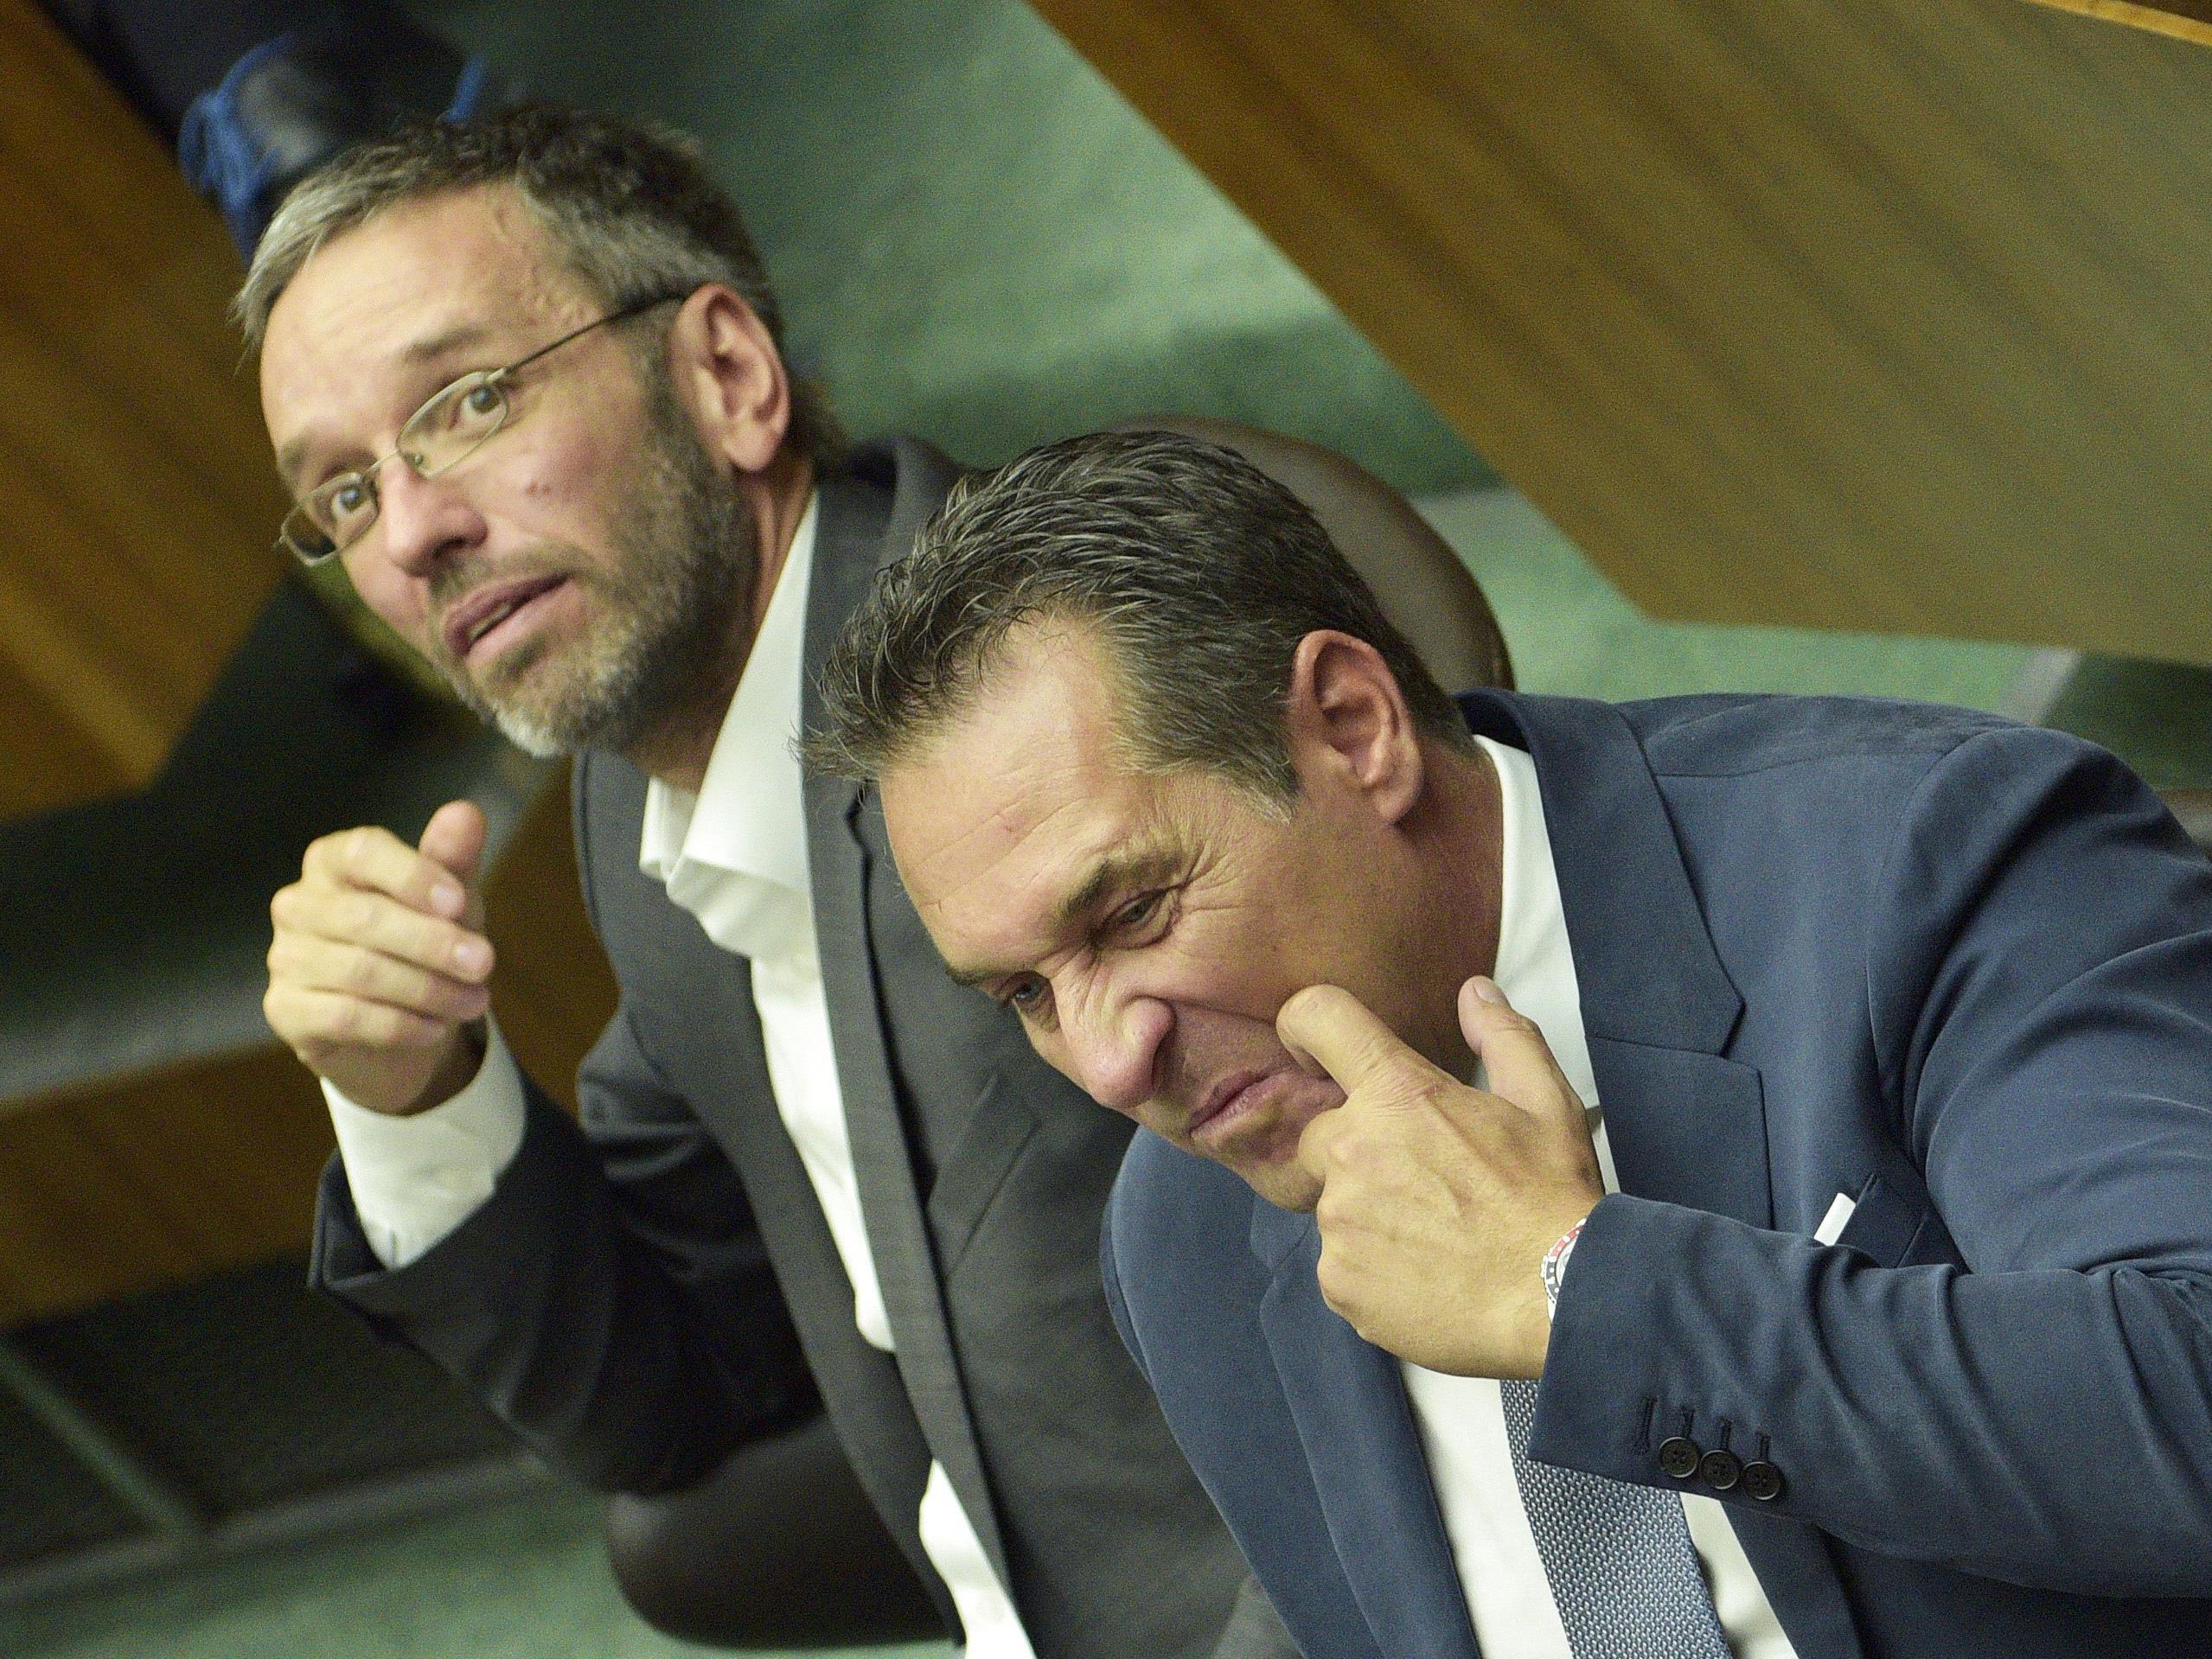 (v.l.), Generalsekretär Herbert Kickl, Bundesparteiobmann Heinz Christian Strache (FPÖ)